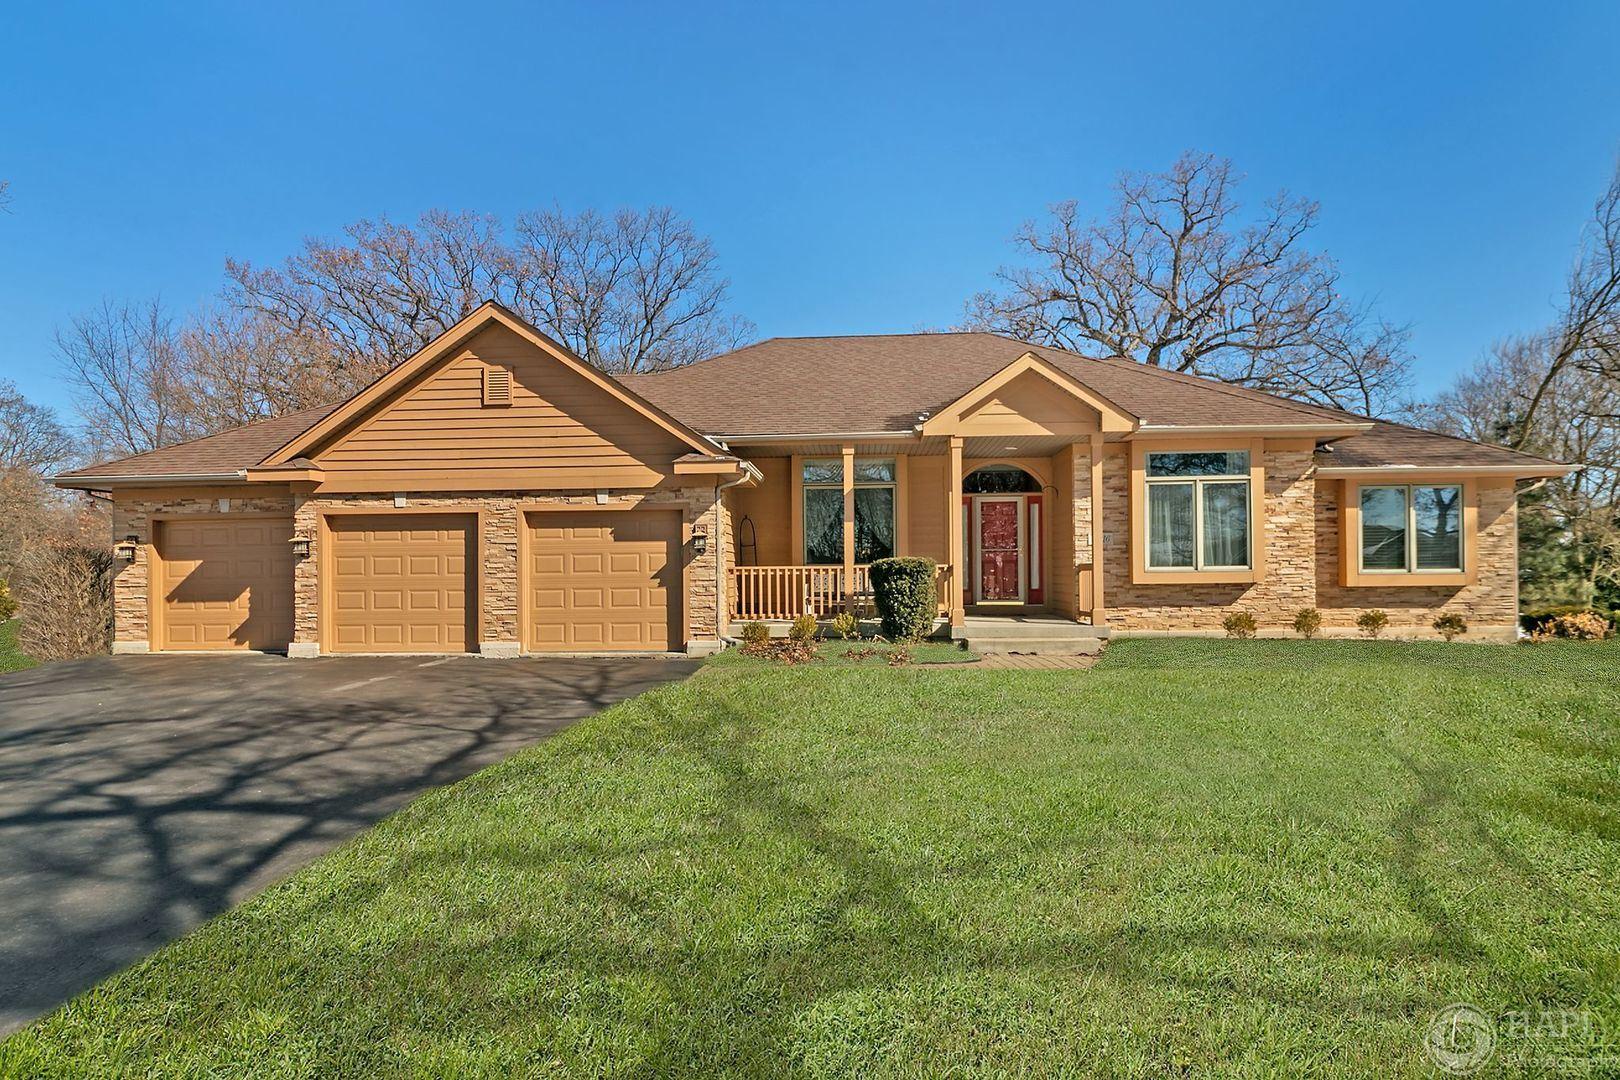 10916 Hickory Nut Way, Richmond, IL 60071 - #: 10652221